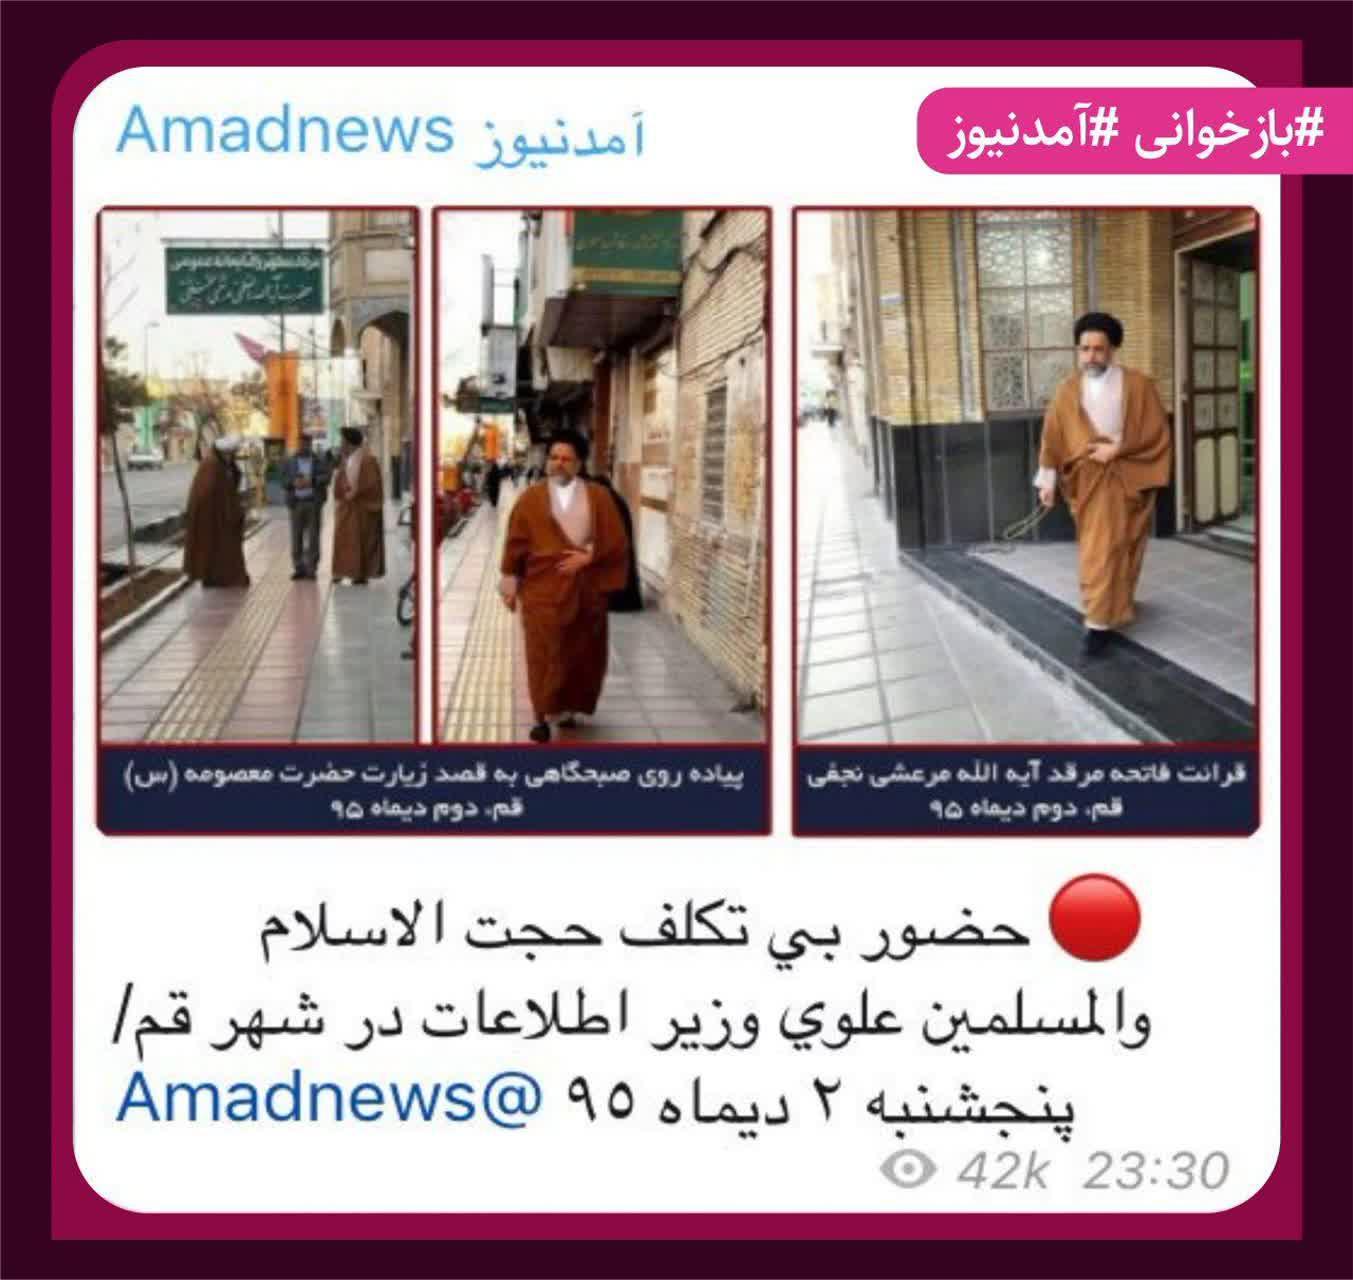 http://dl-abbasi.ir/yekta/1398/Graphic/Amadnews/amadnews%20(9).jpg